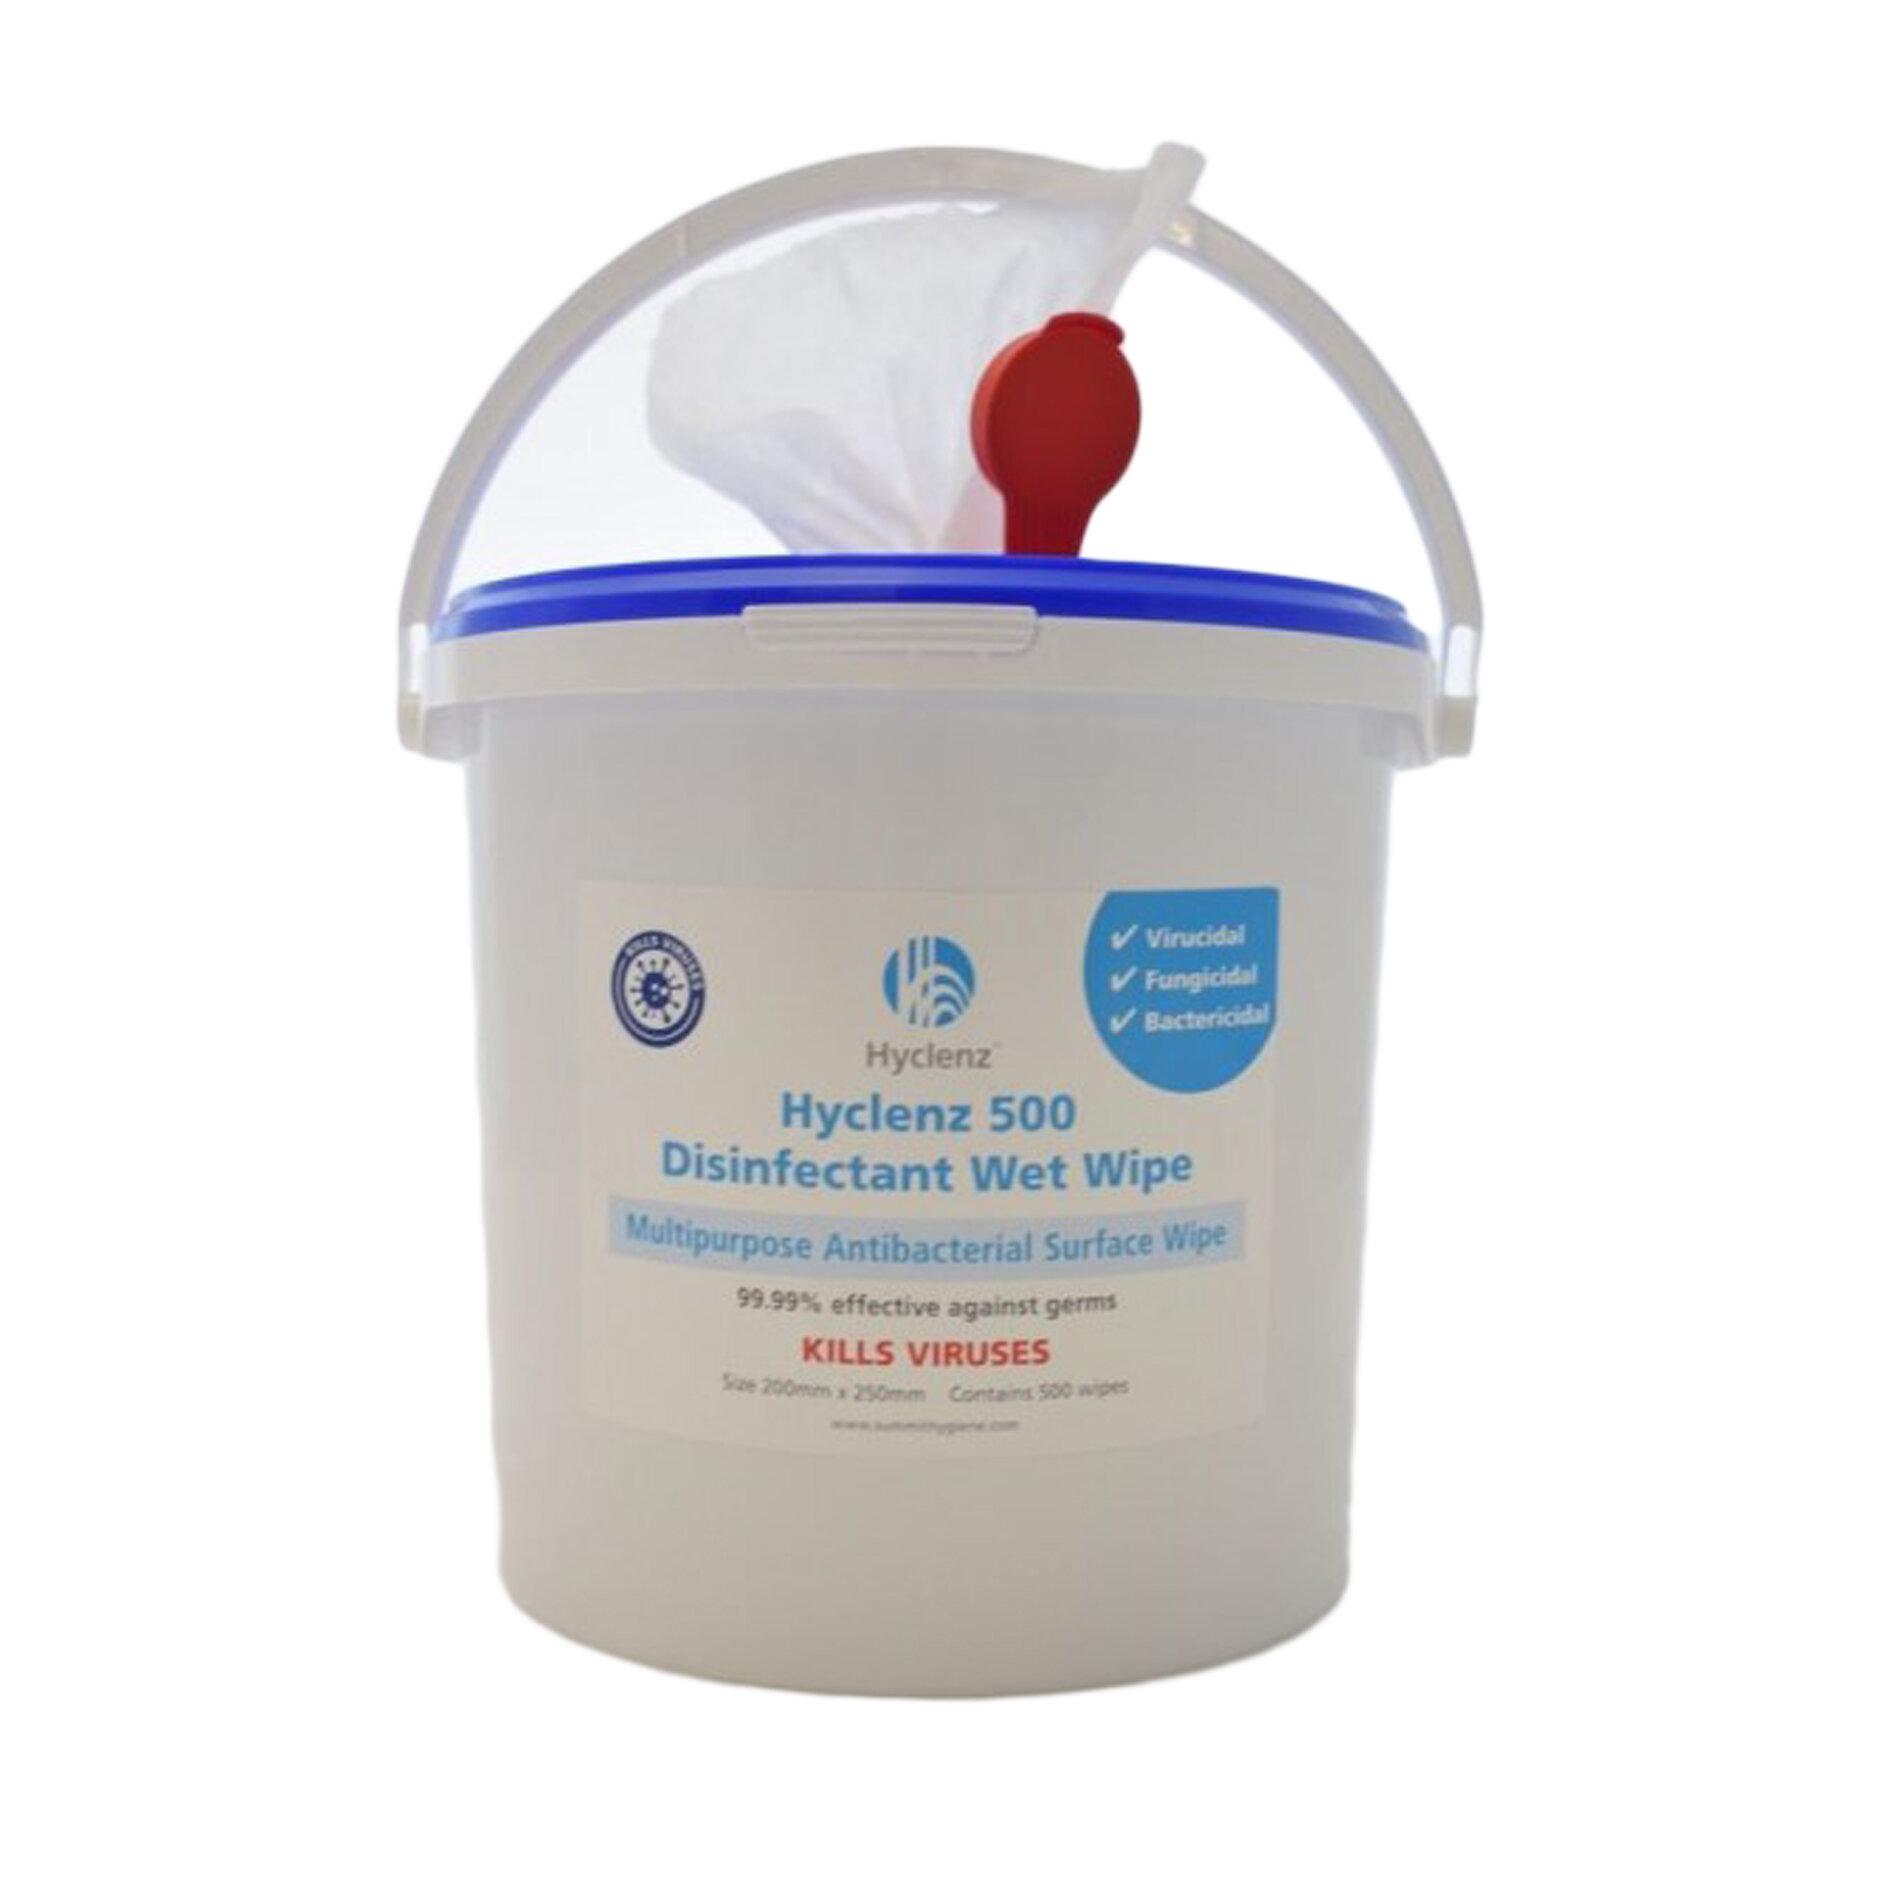 Hyclenz 500 Disinfectant Wipe (Bucket)